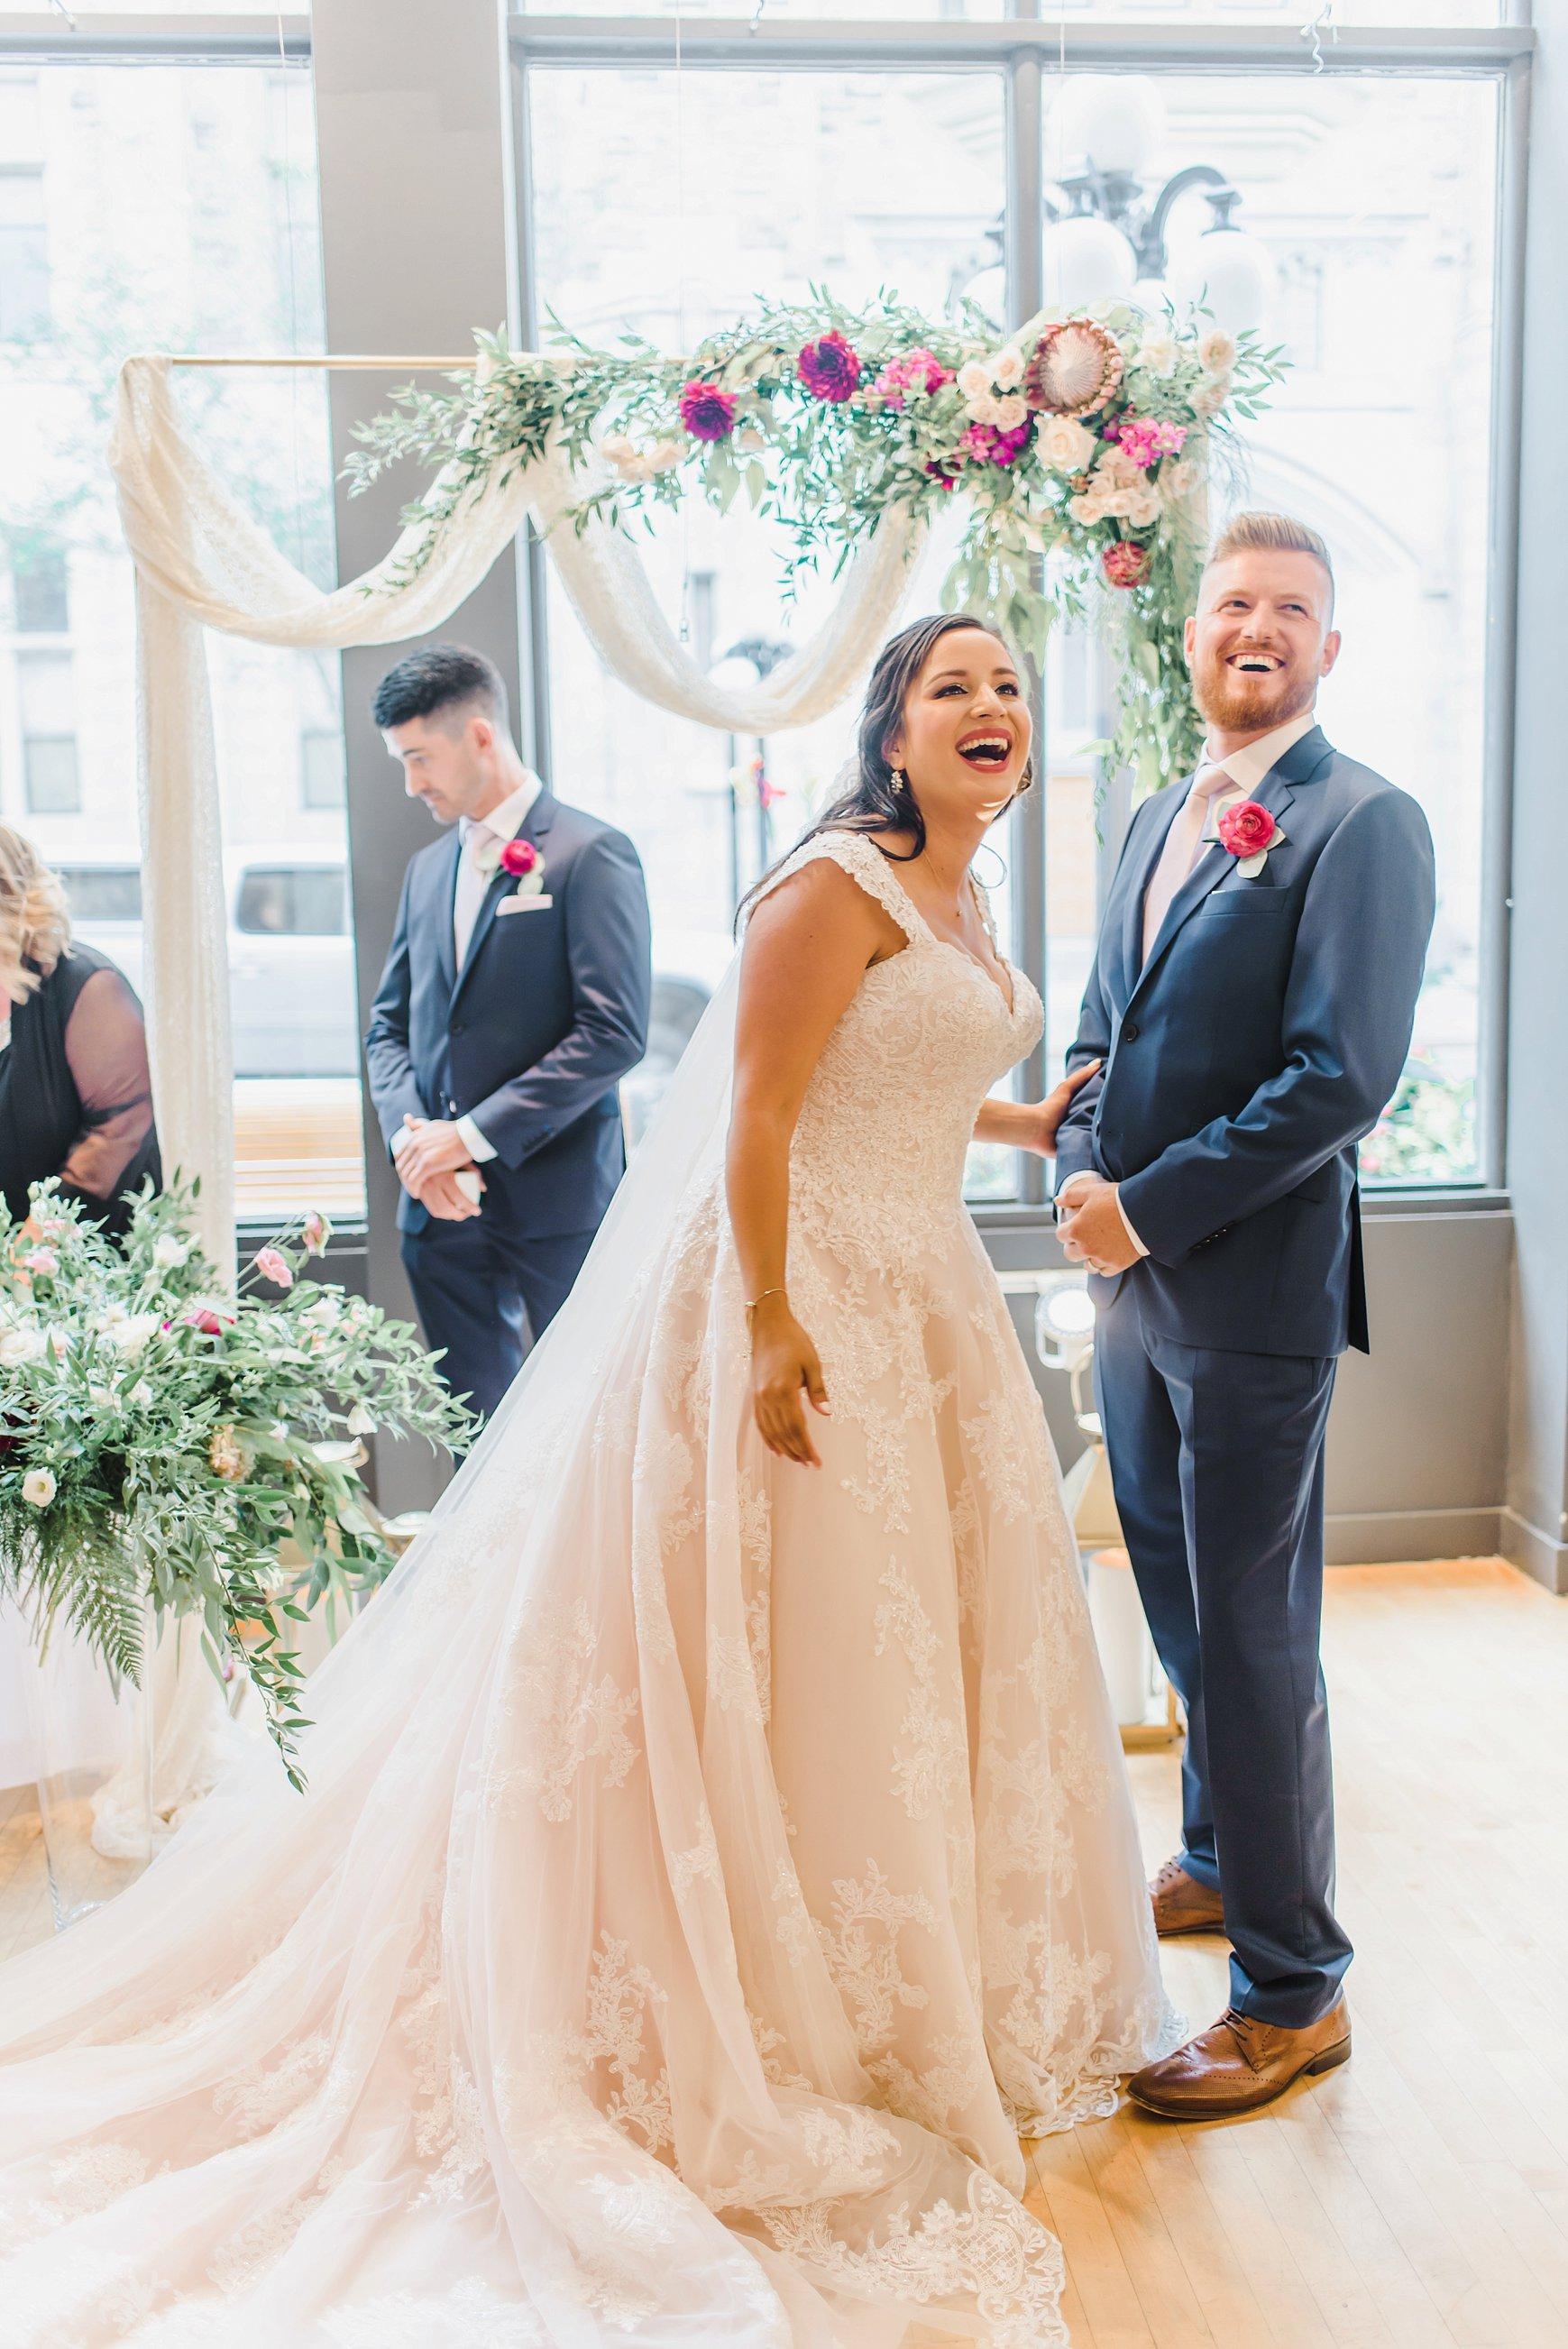 light airy indie fine art ottawa wedding photographer | Ali and Batoul Photography_1601.jpg